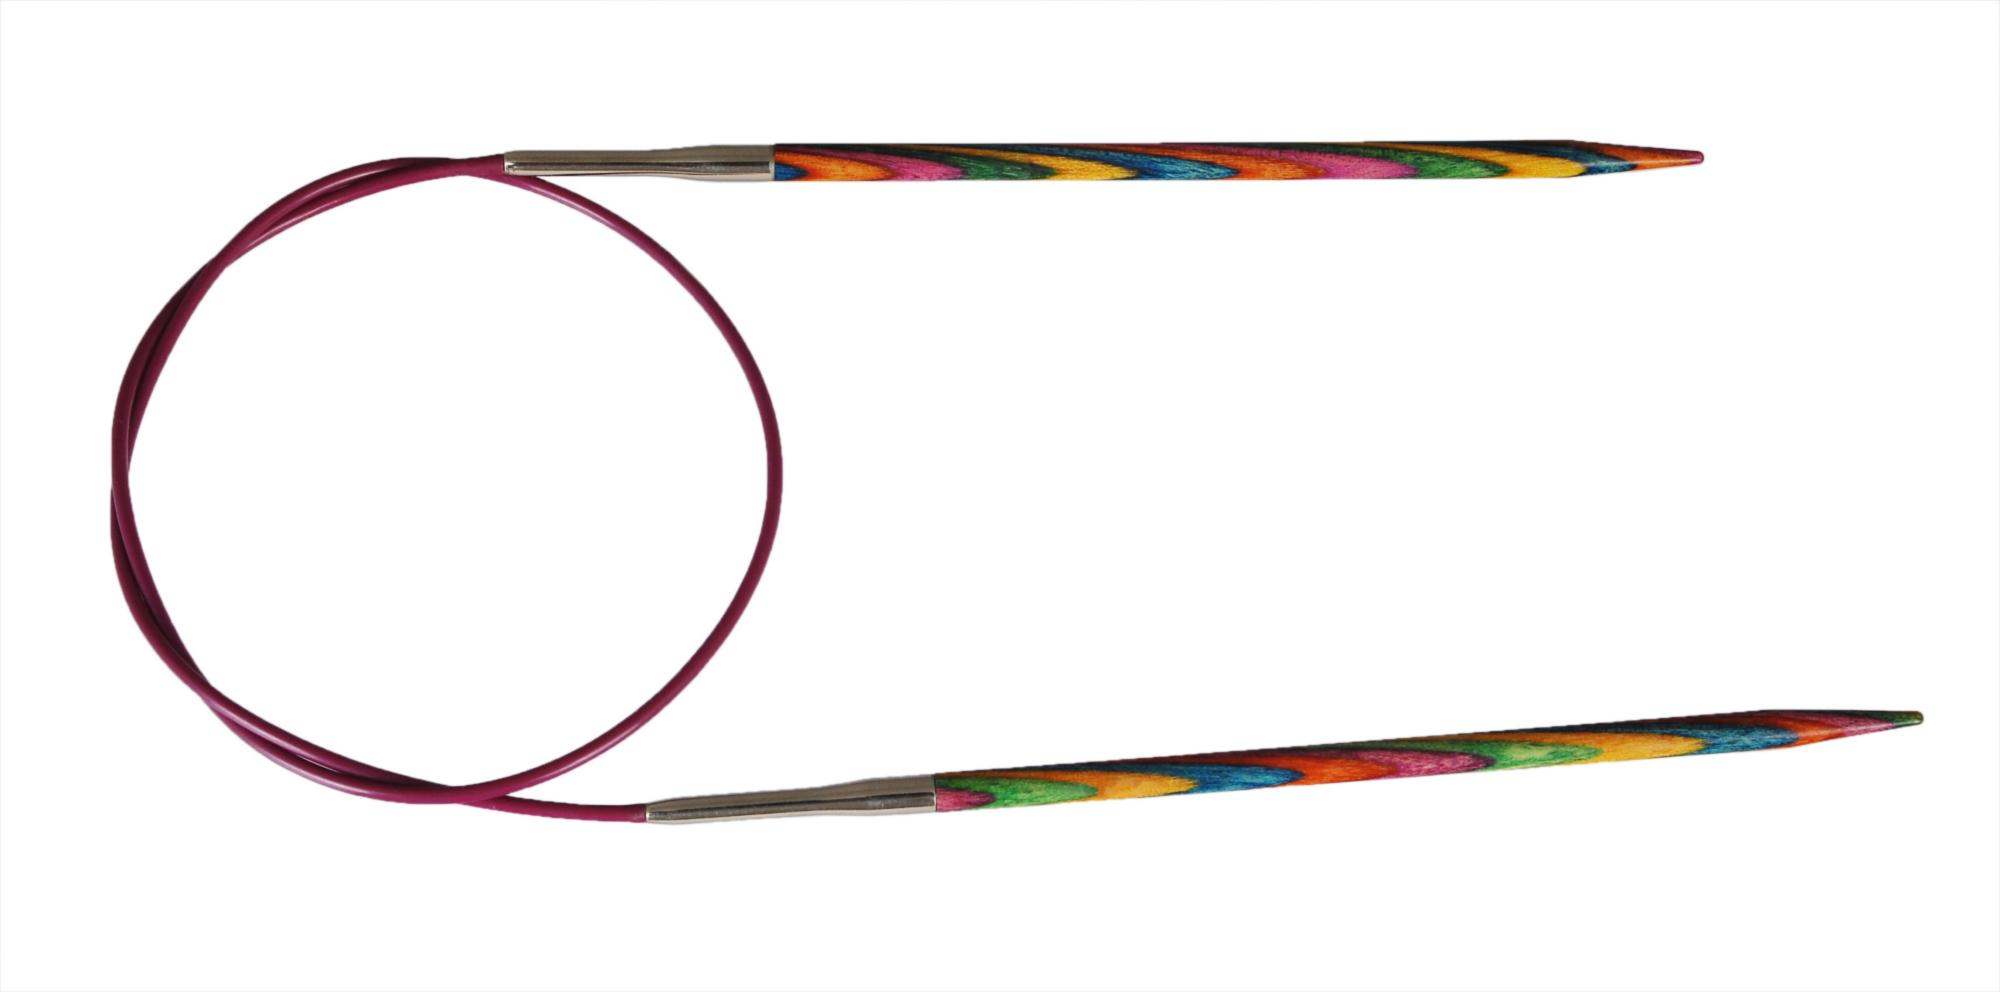 Спицы круговые 150 см Symfonie Wood KnitPro, 21383, 4.50 мм